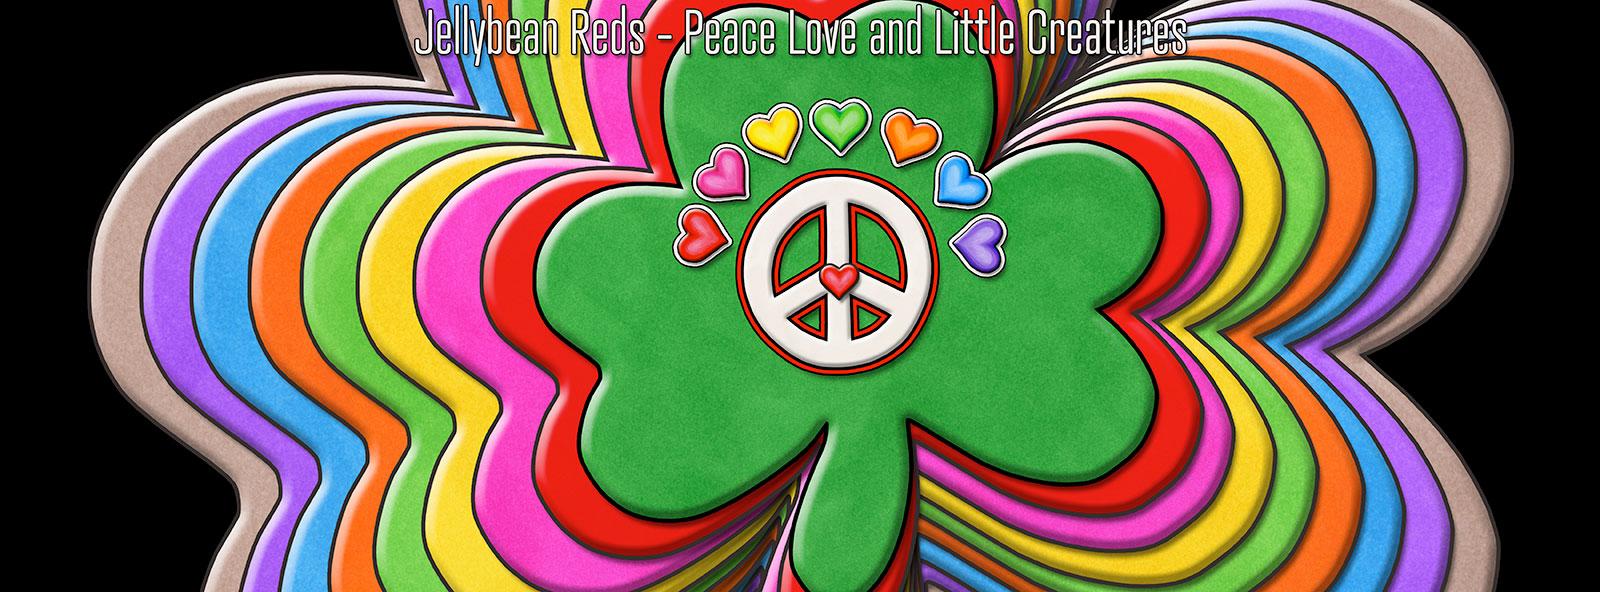 Rainbow Shamrocks with Peace Sign and Hearts